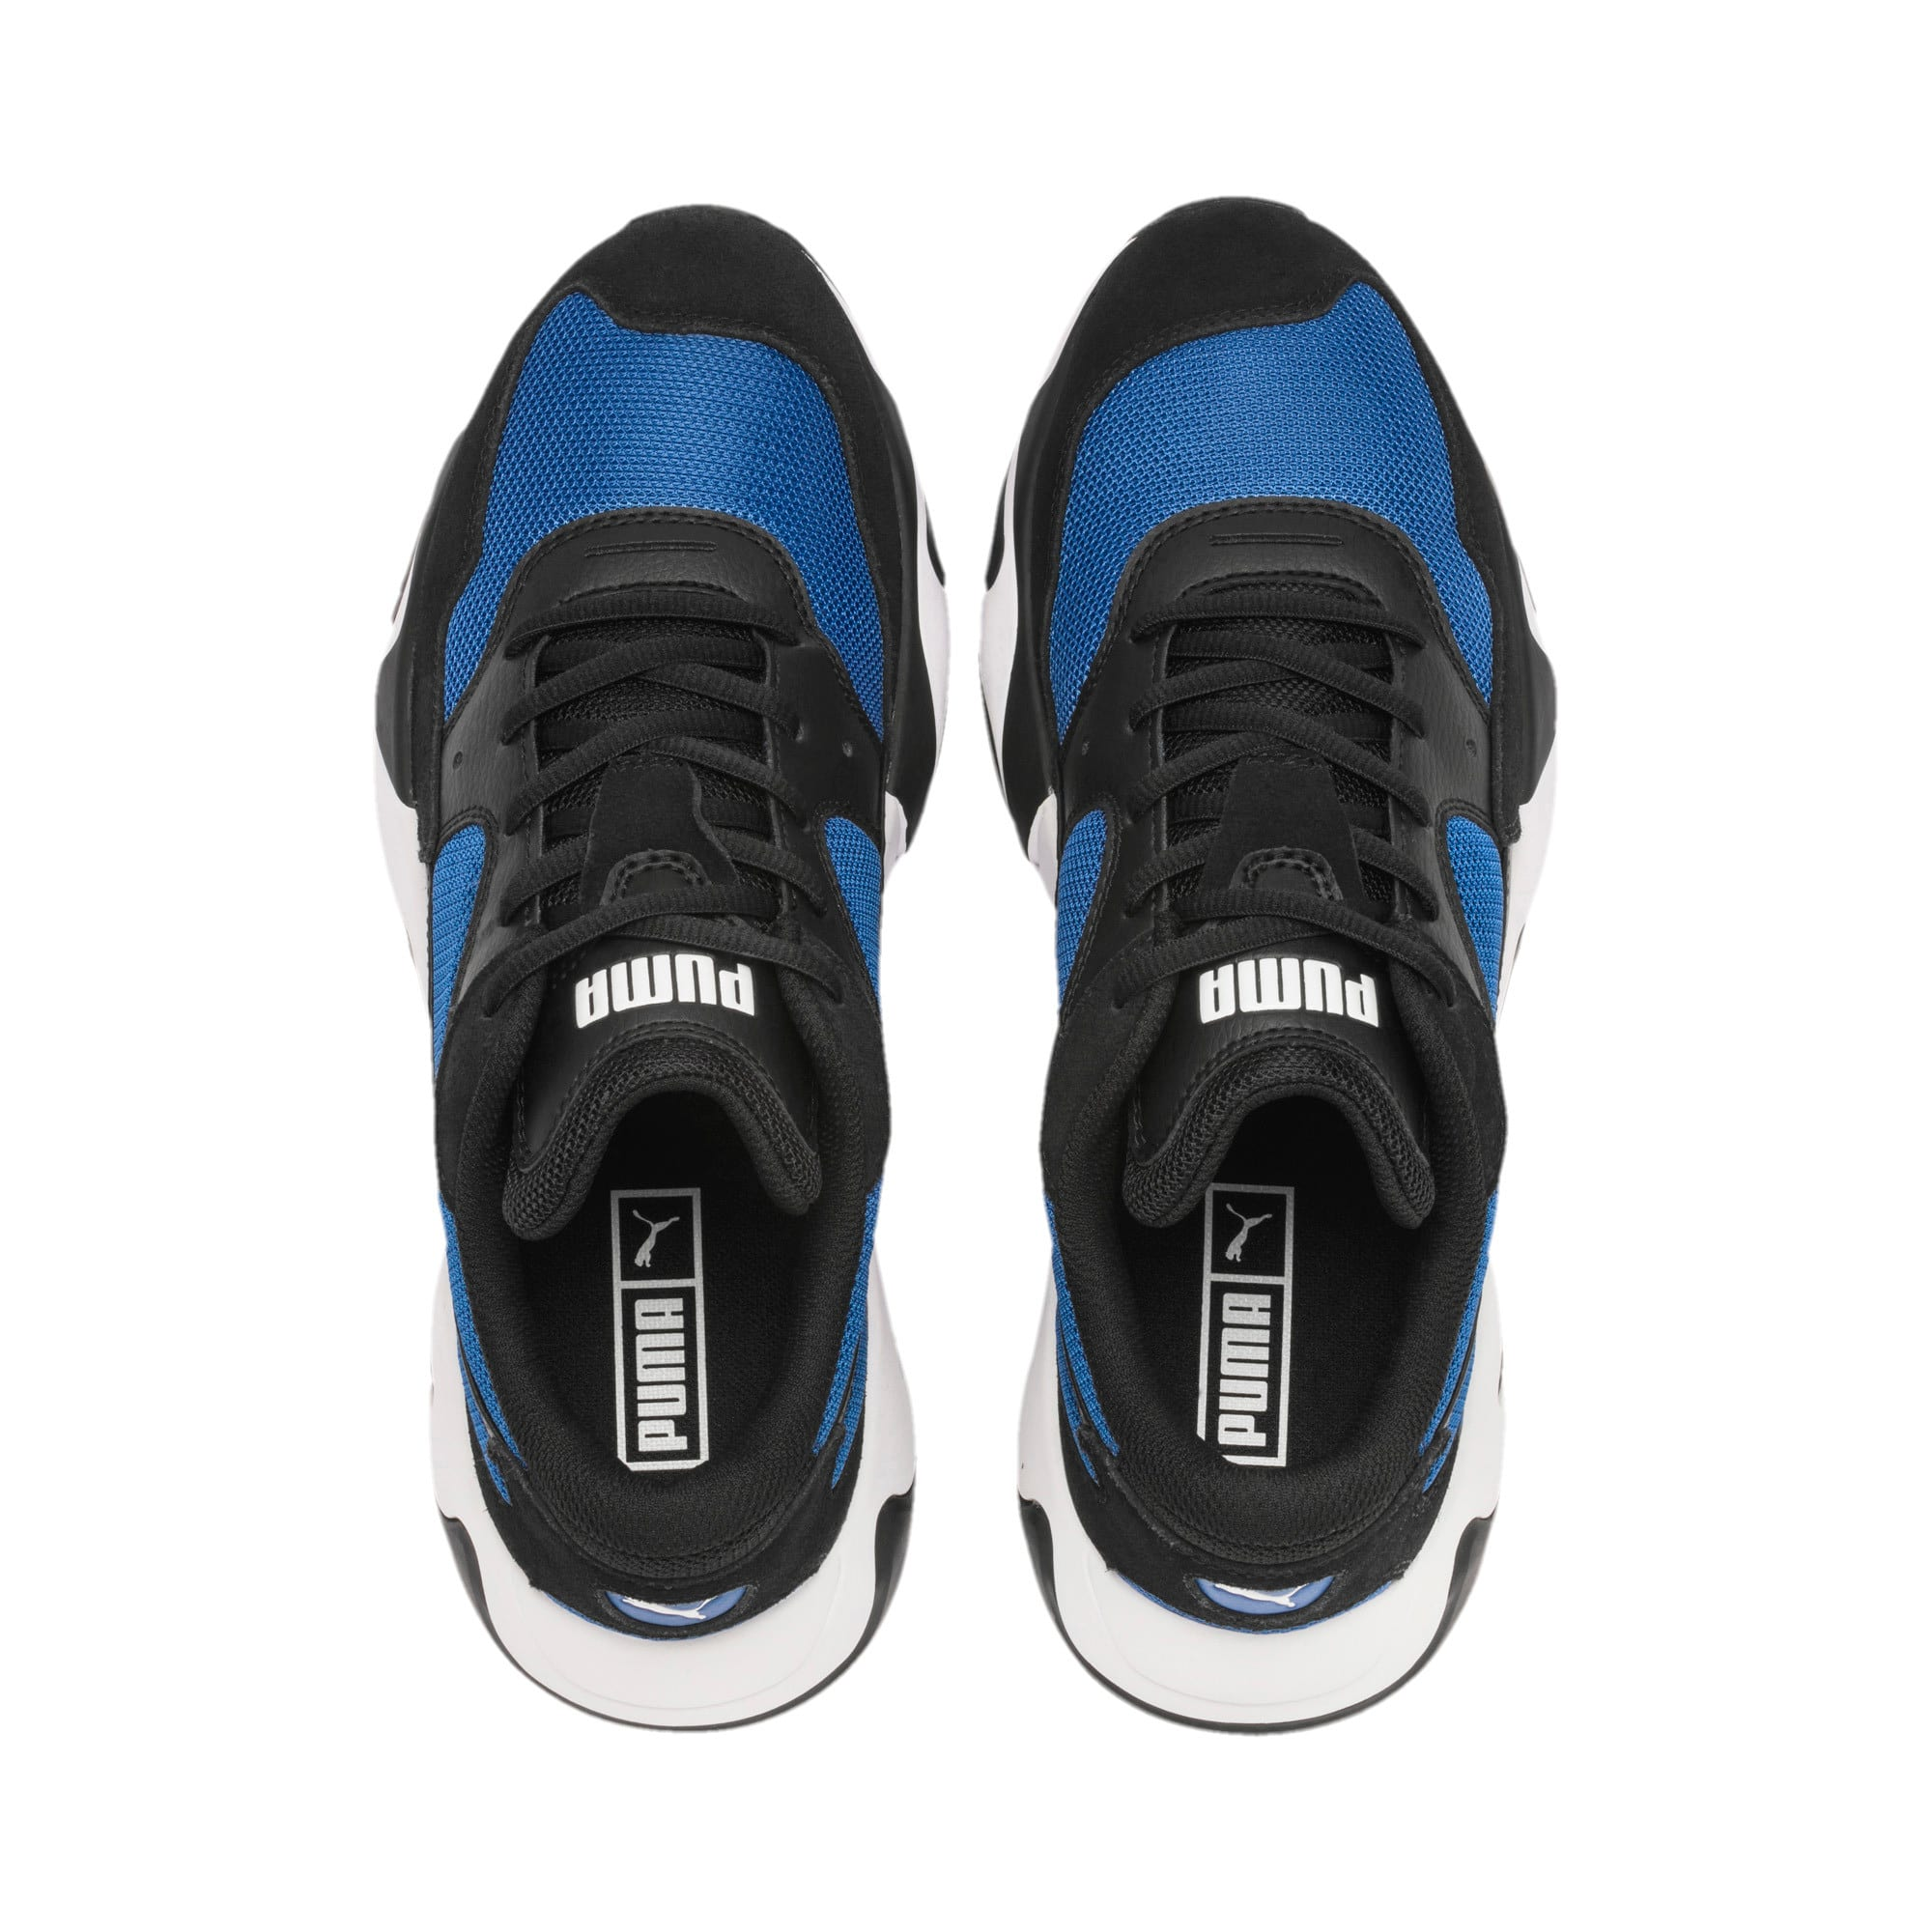 Thumbnail 7 of Storm Adrenaline Sneakers, Puma Black-Galaxy Blue, medium